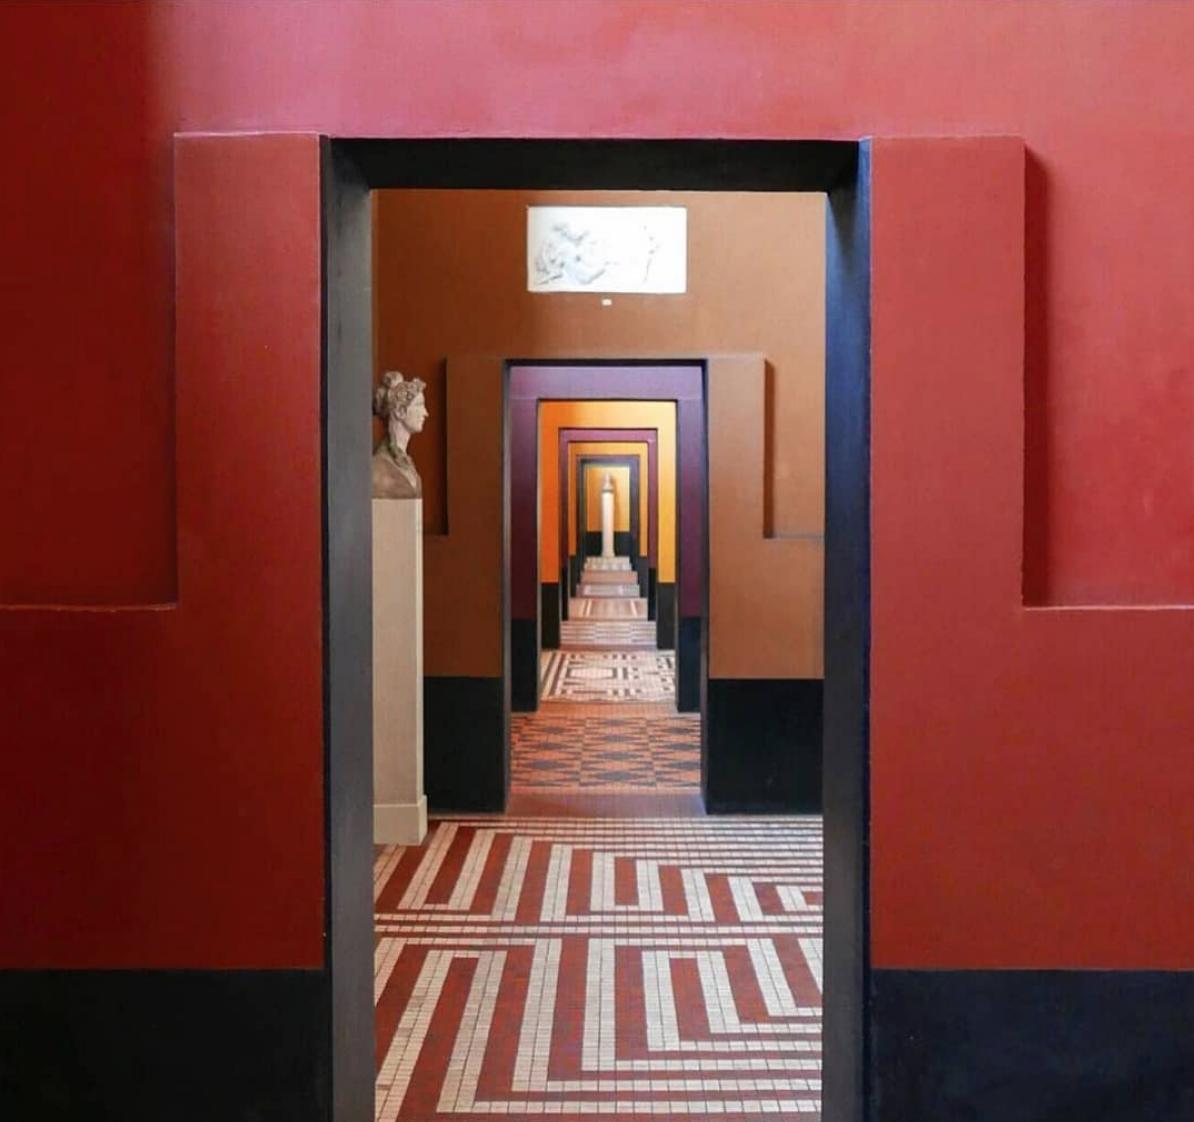 The Thorvaldsen Museum in Copenhagen